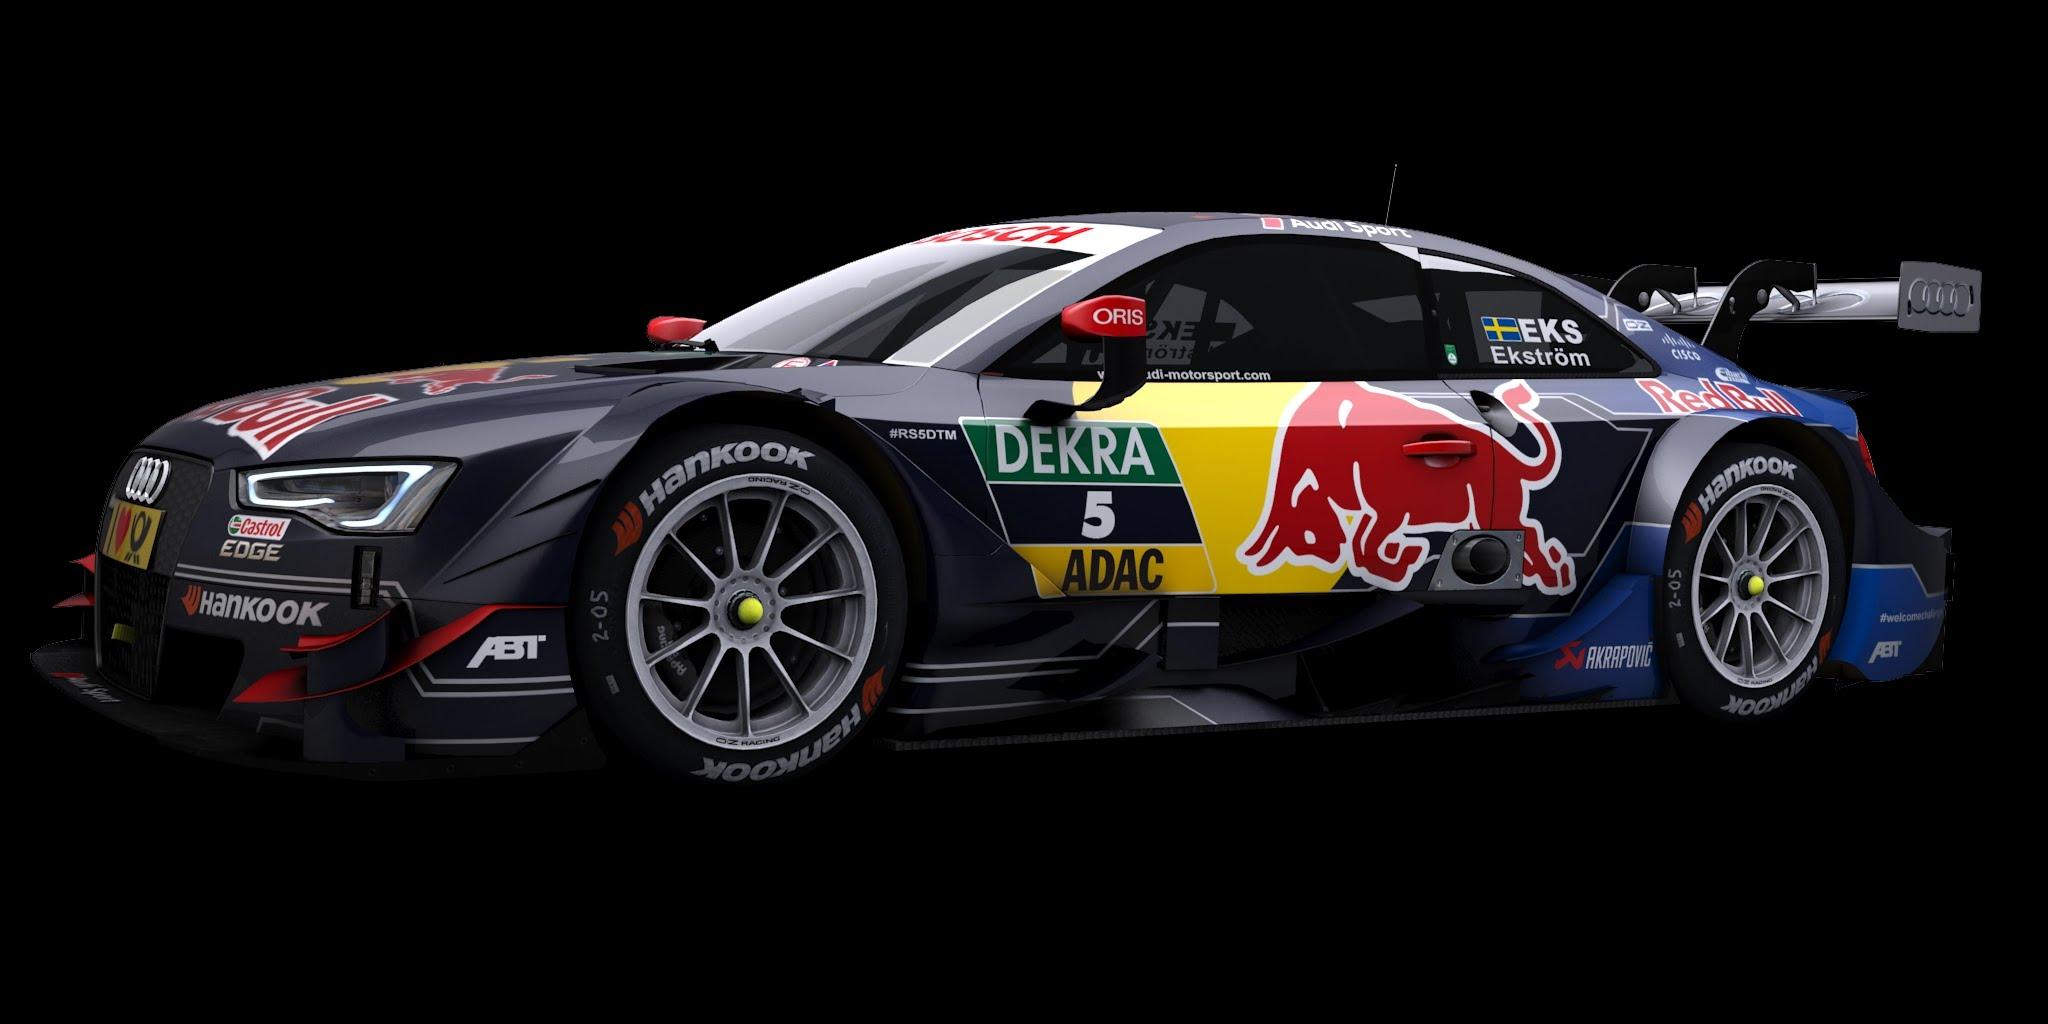 RaceRoom Racing Experience Audi RS 5 DTM 2015 Hockenheim 1:33:214